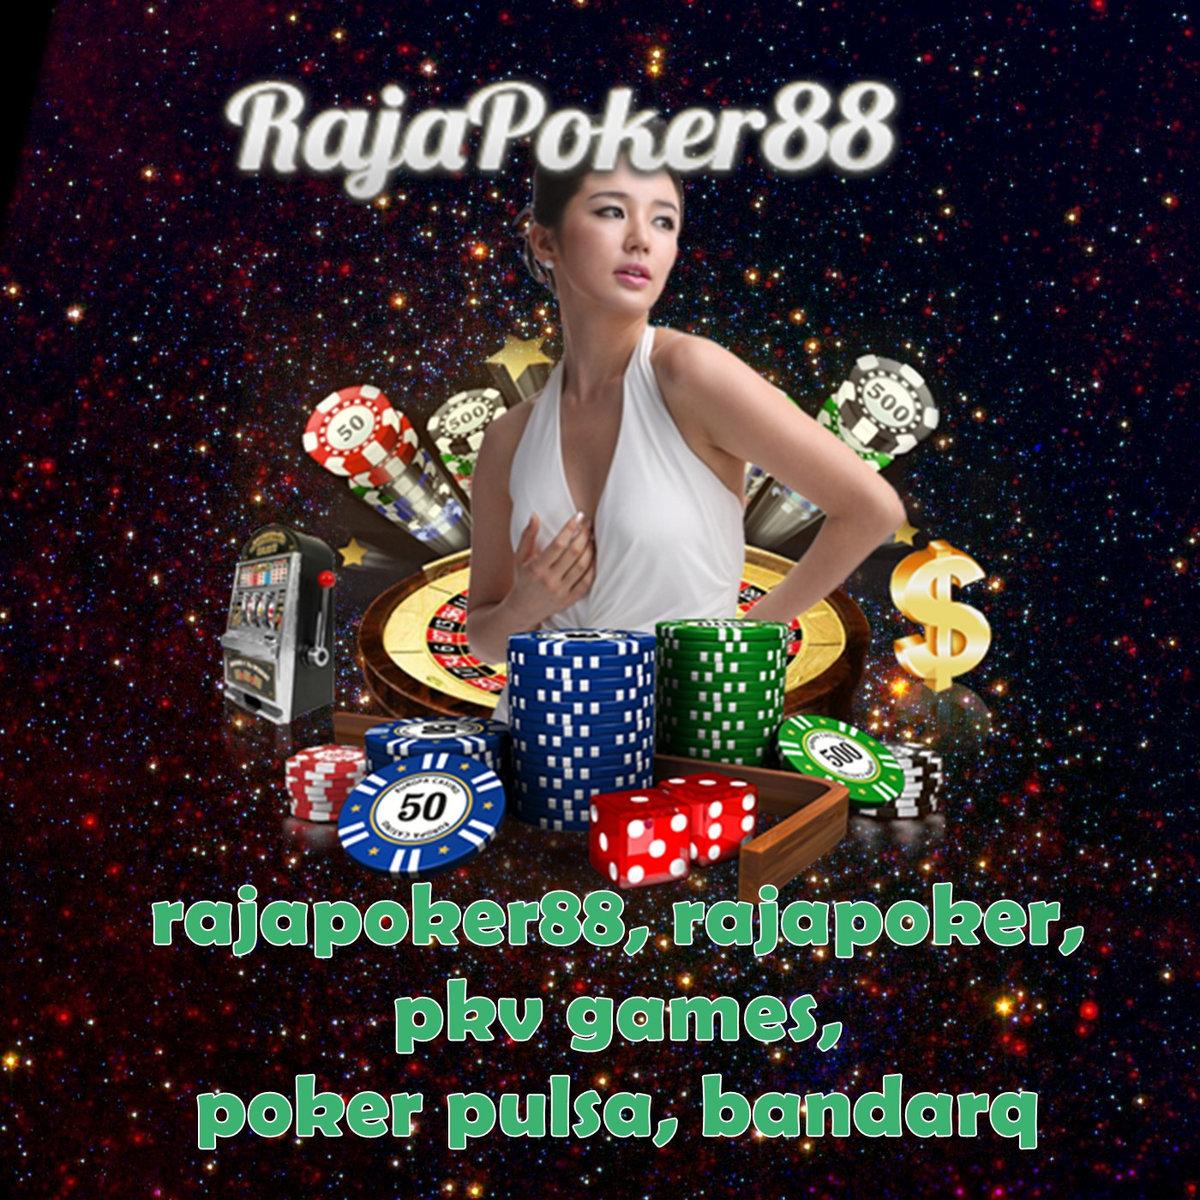 Rajapoker88 Rajapoker Pkv Games Poker Pulsa Bandarq Rajapoker88 Rajapoker88 Rajapoker Pkv Games Poker Pulsa Bandarq